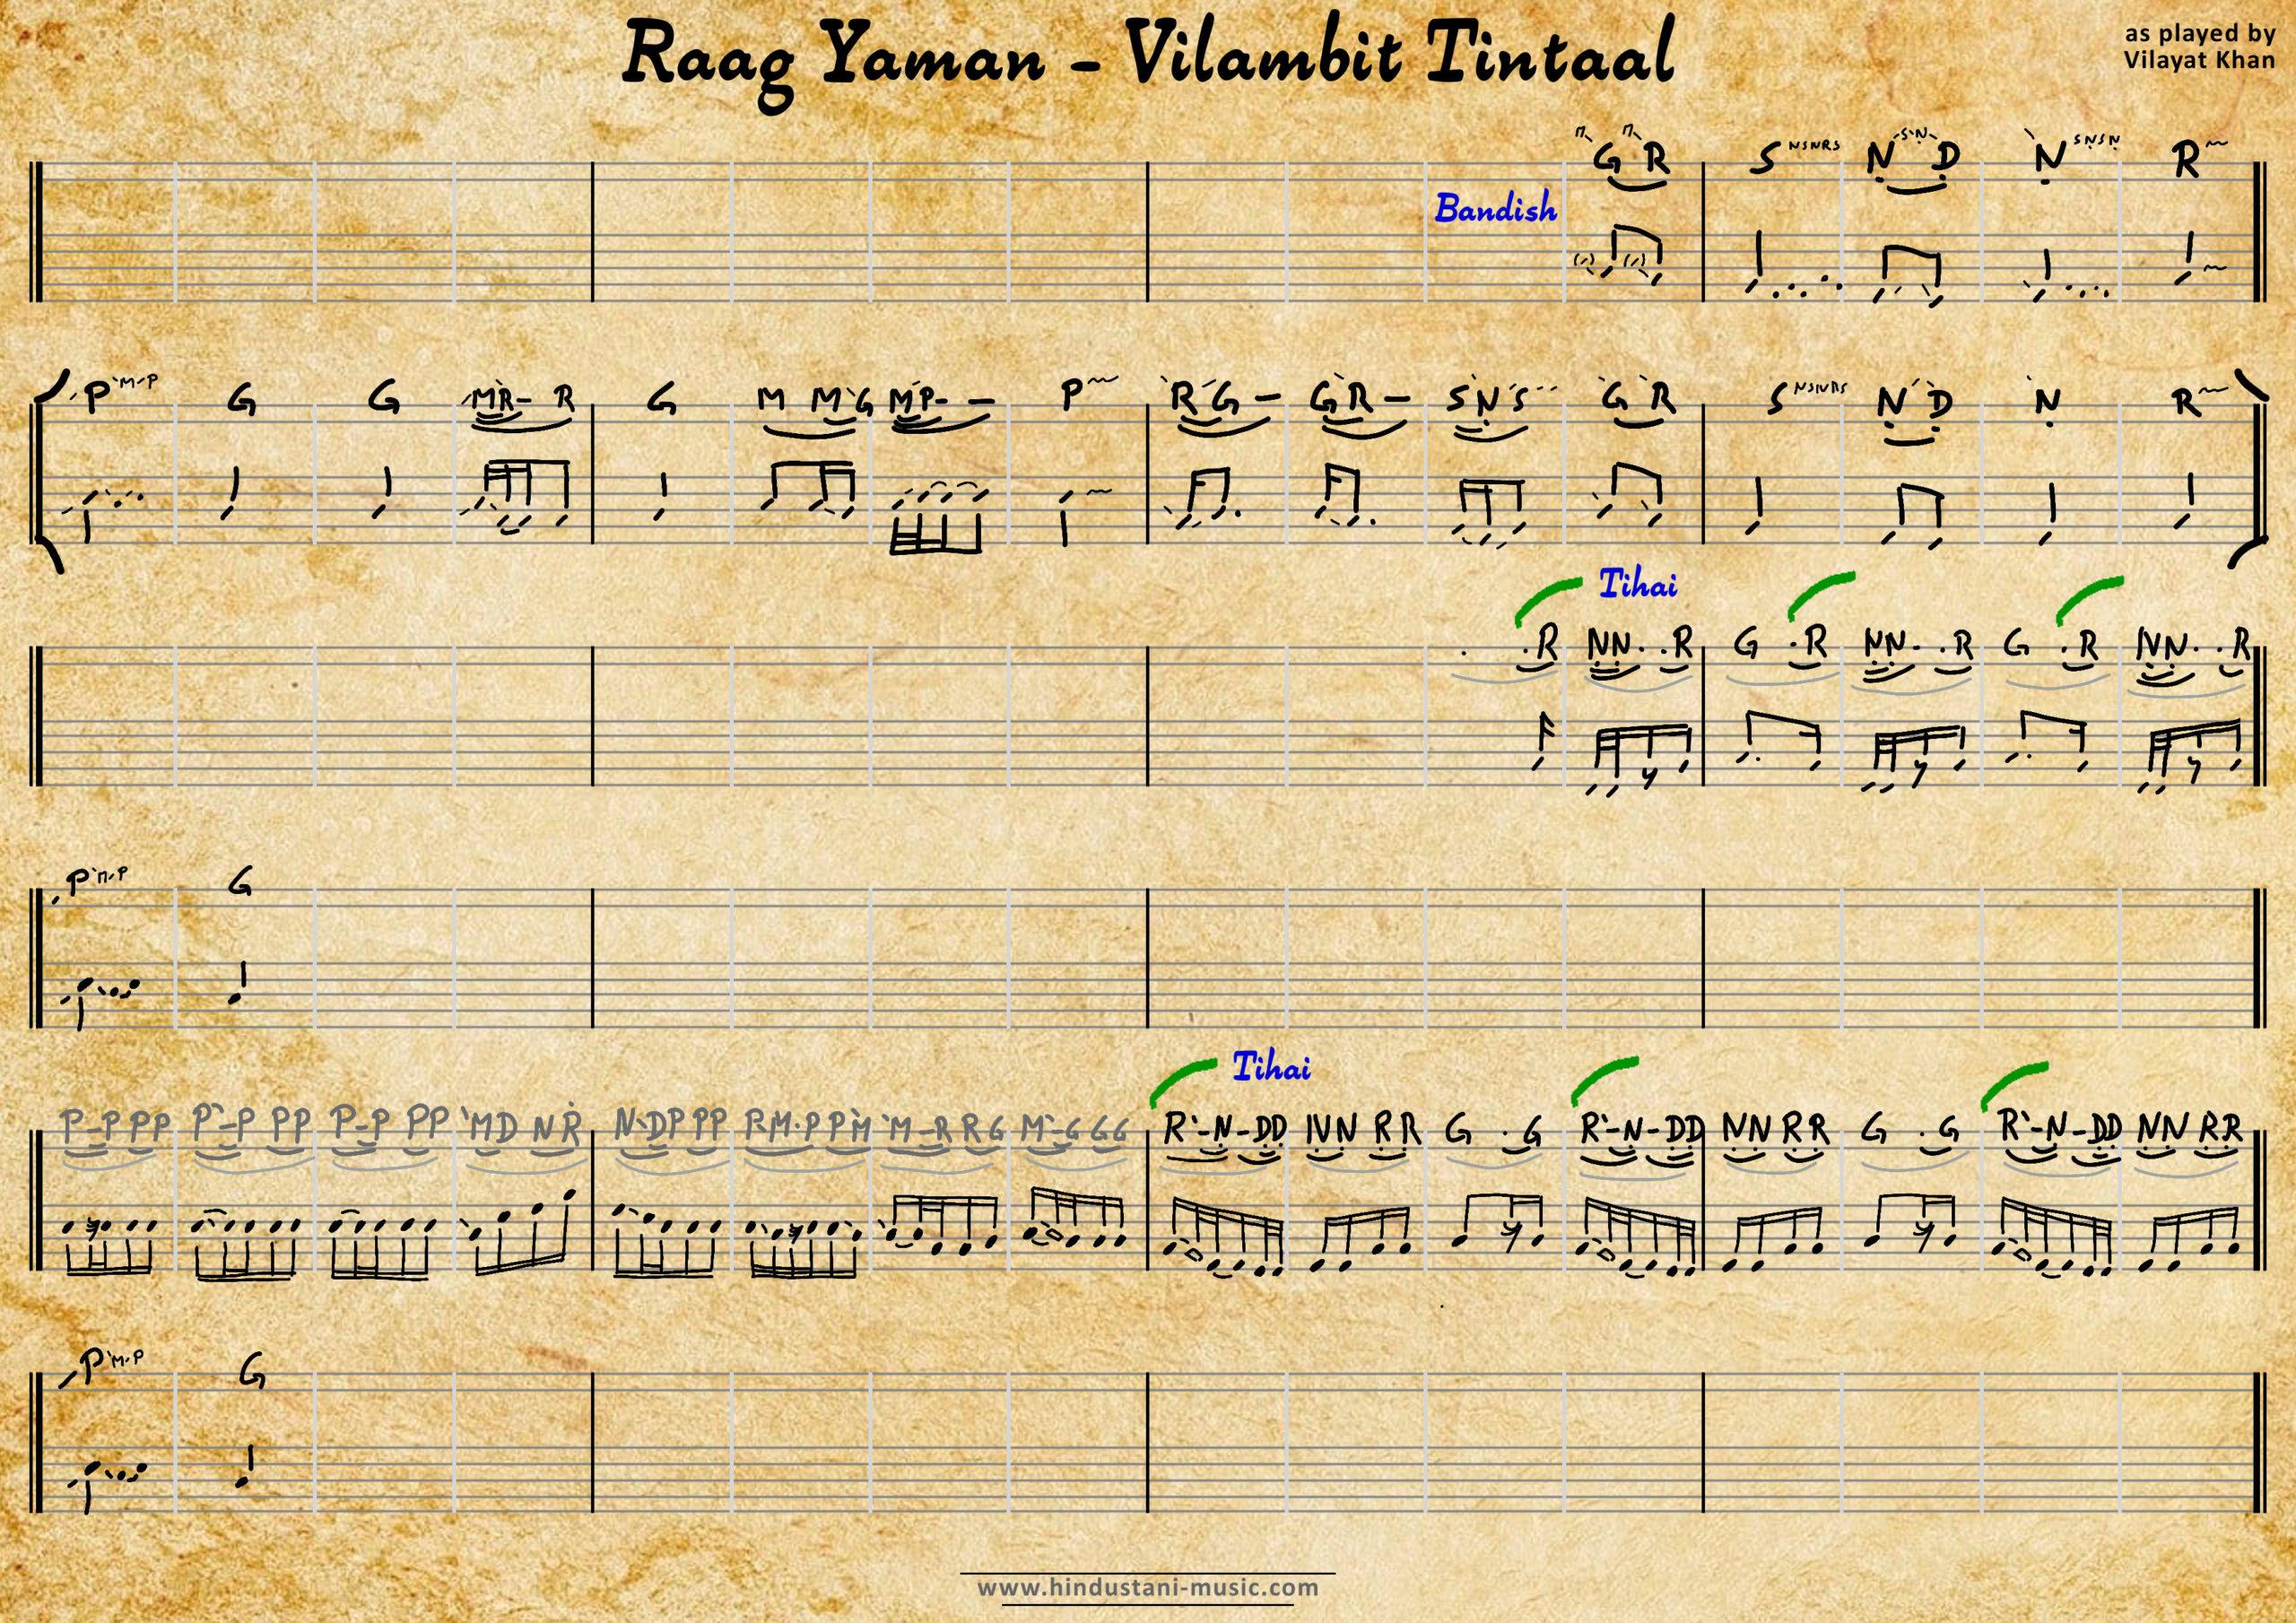 Yaman - VILAYAT KHAN - Vilambit Tintaal